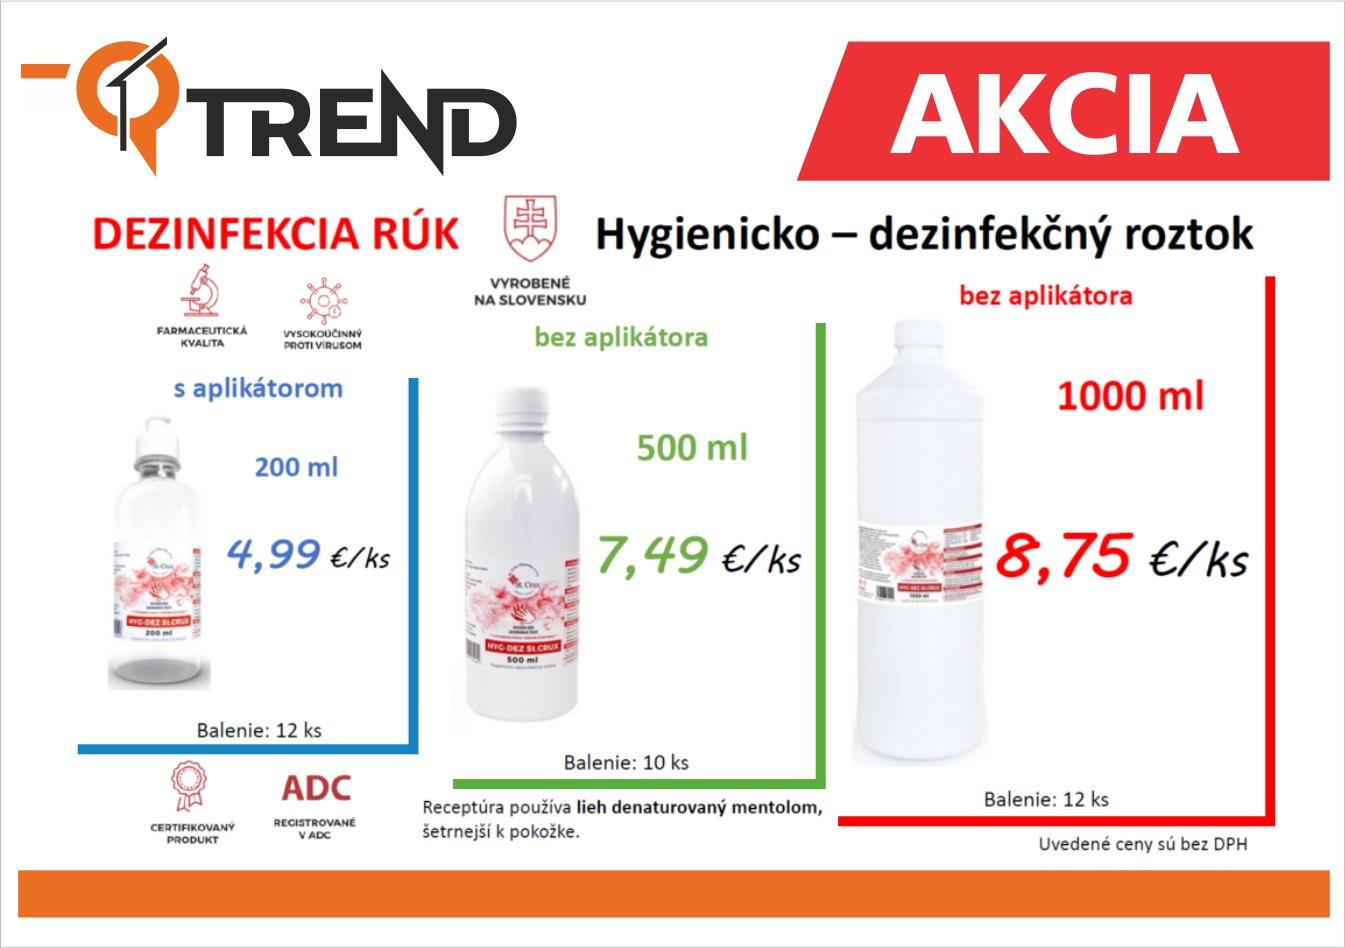 dezinfekcia_qtrend_akcia_1